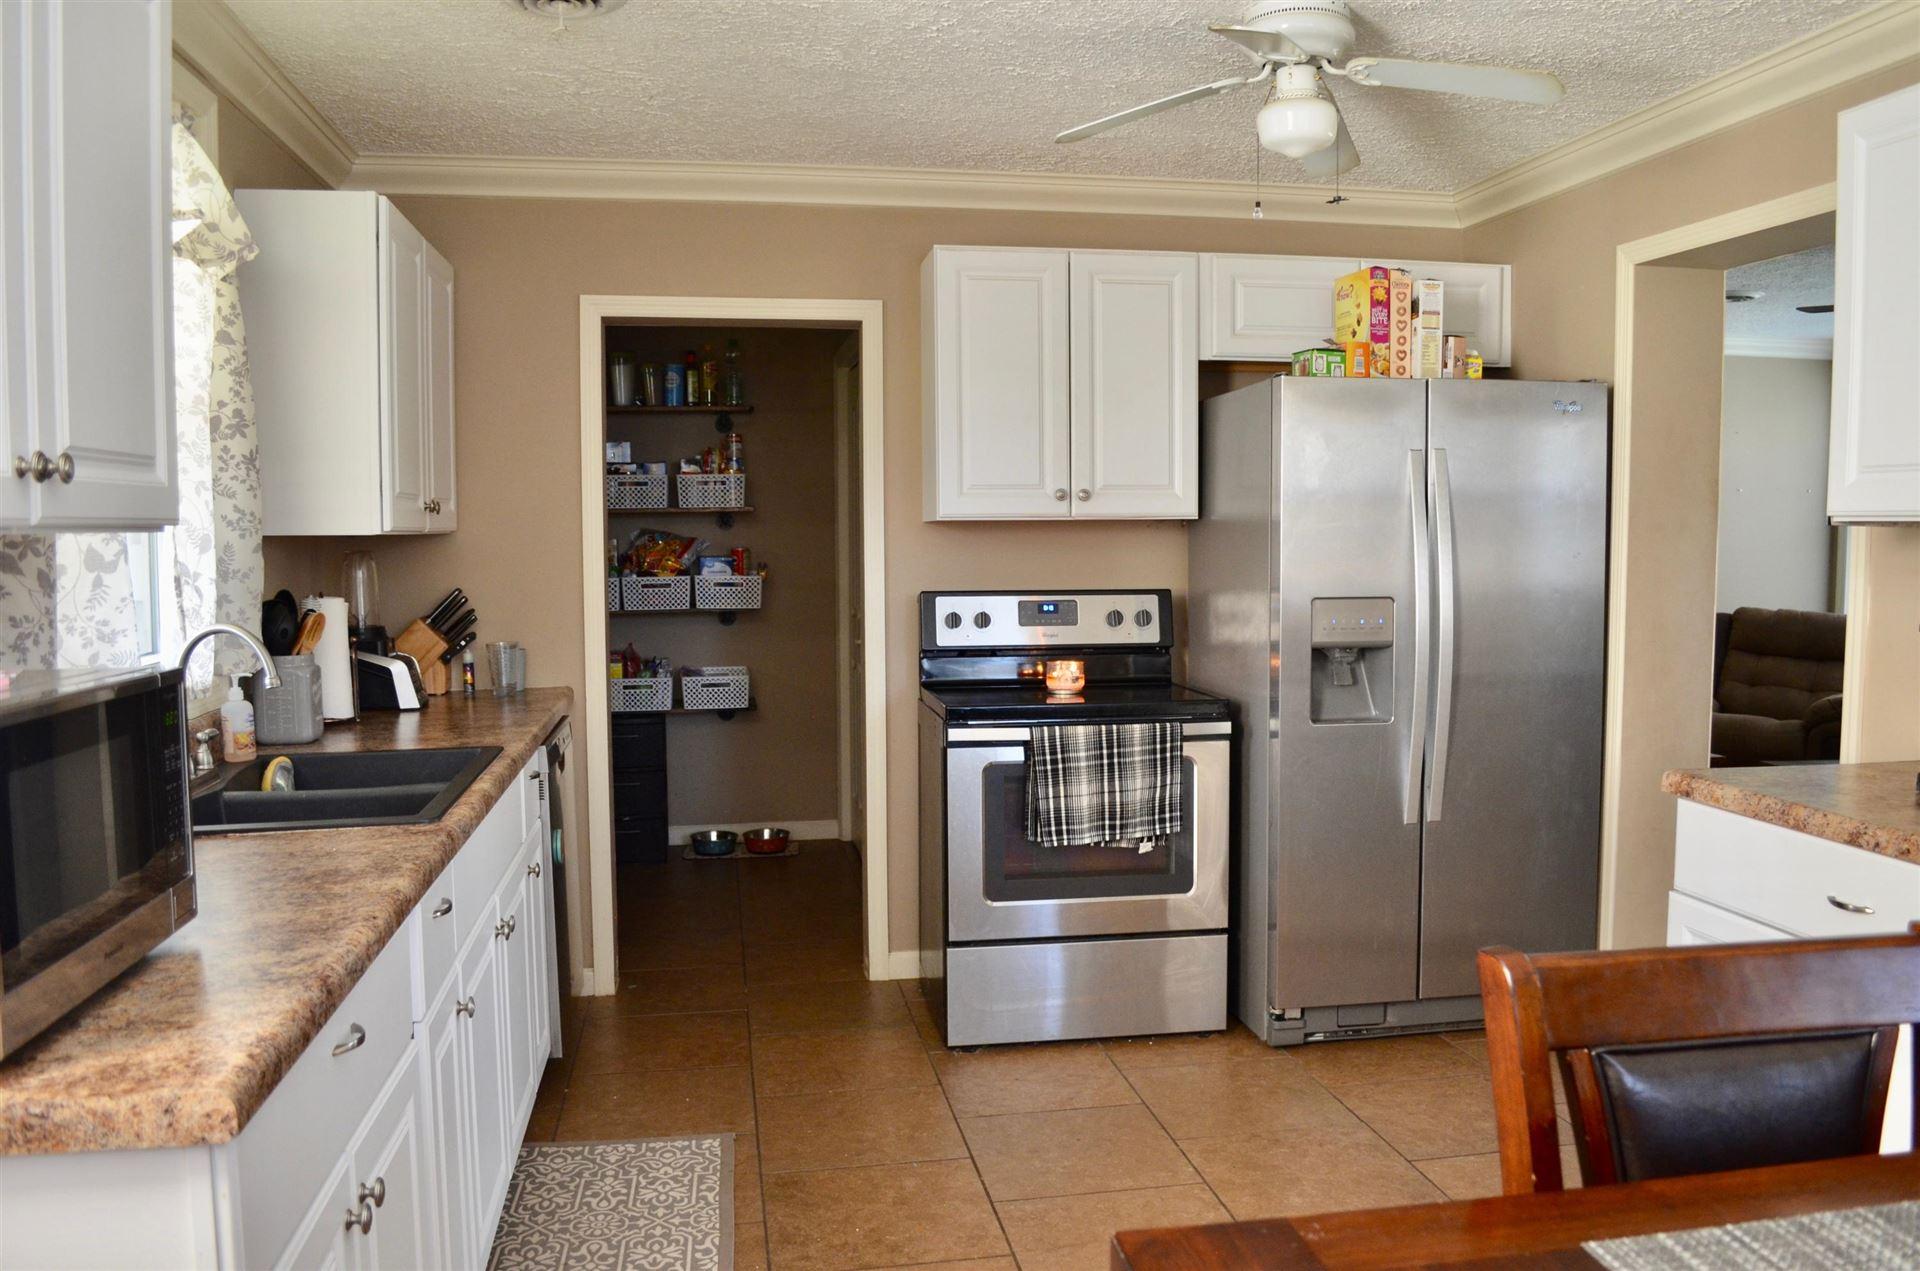 Photo of 157 Northwestern Ave, Oak Ridge, TN 37830 (MLS # 1147253)